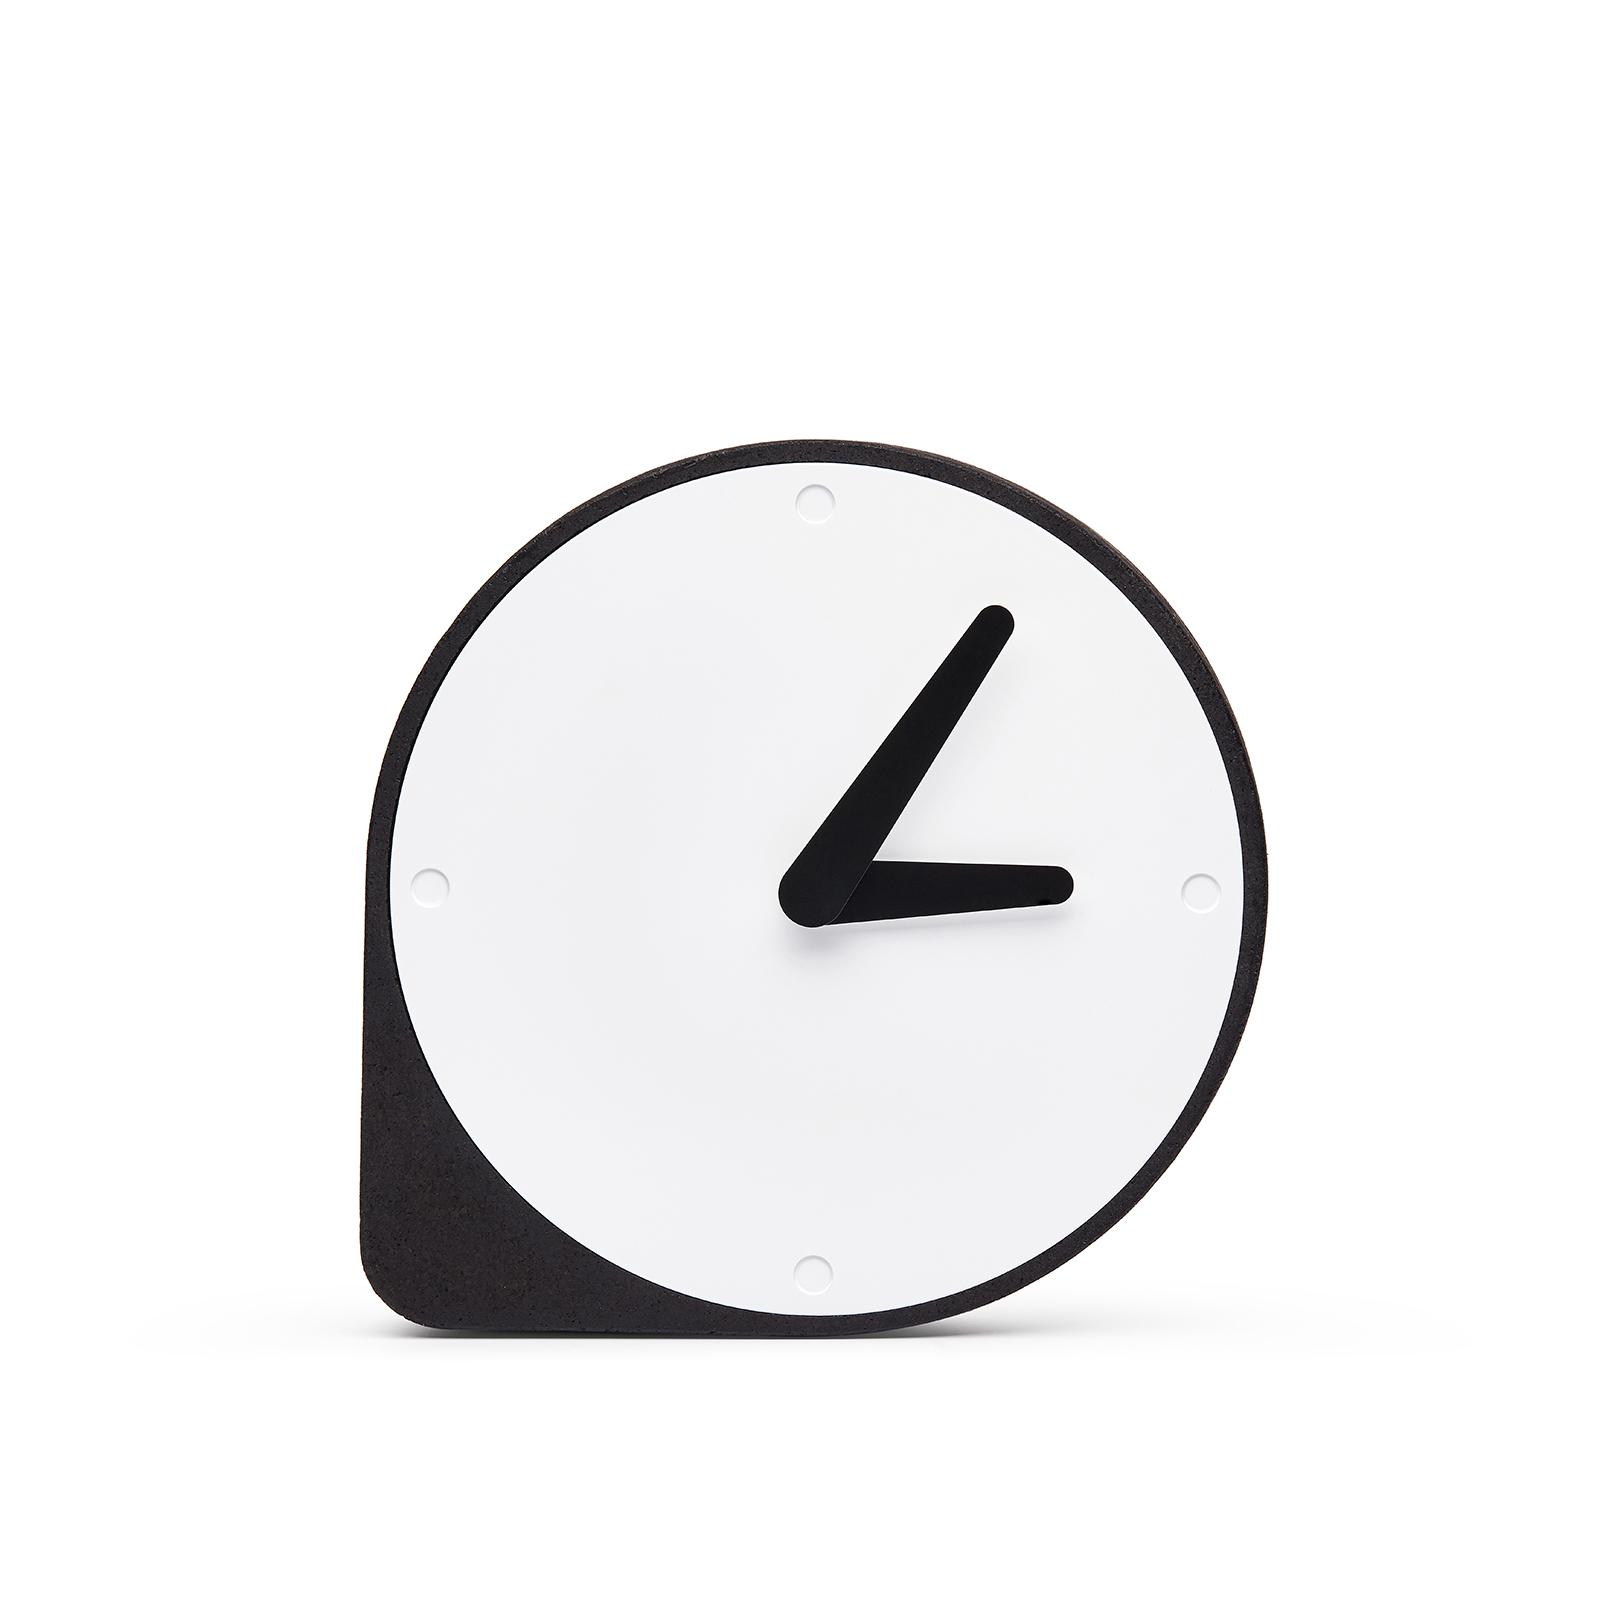 http://www.turbulences-deco.fr/wp-content/uploads/2017/10/puikdesign_horloge-clork.jpg